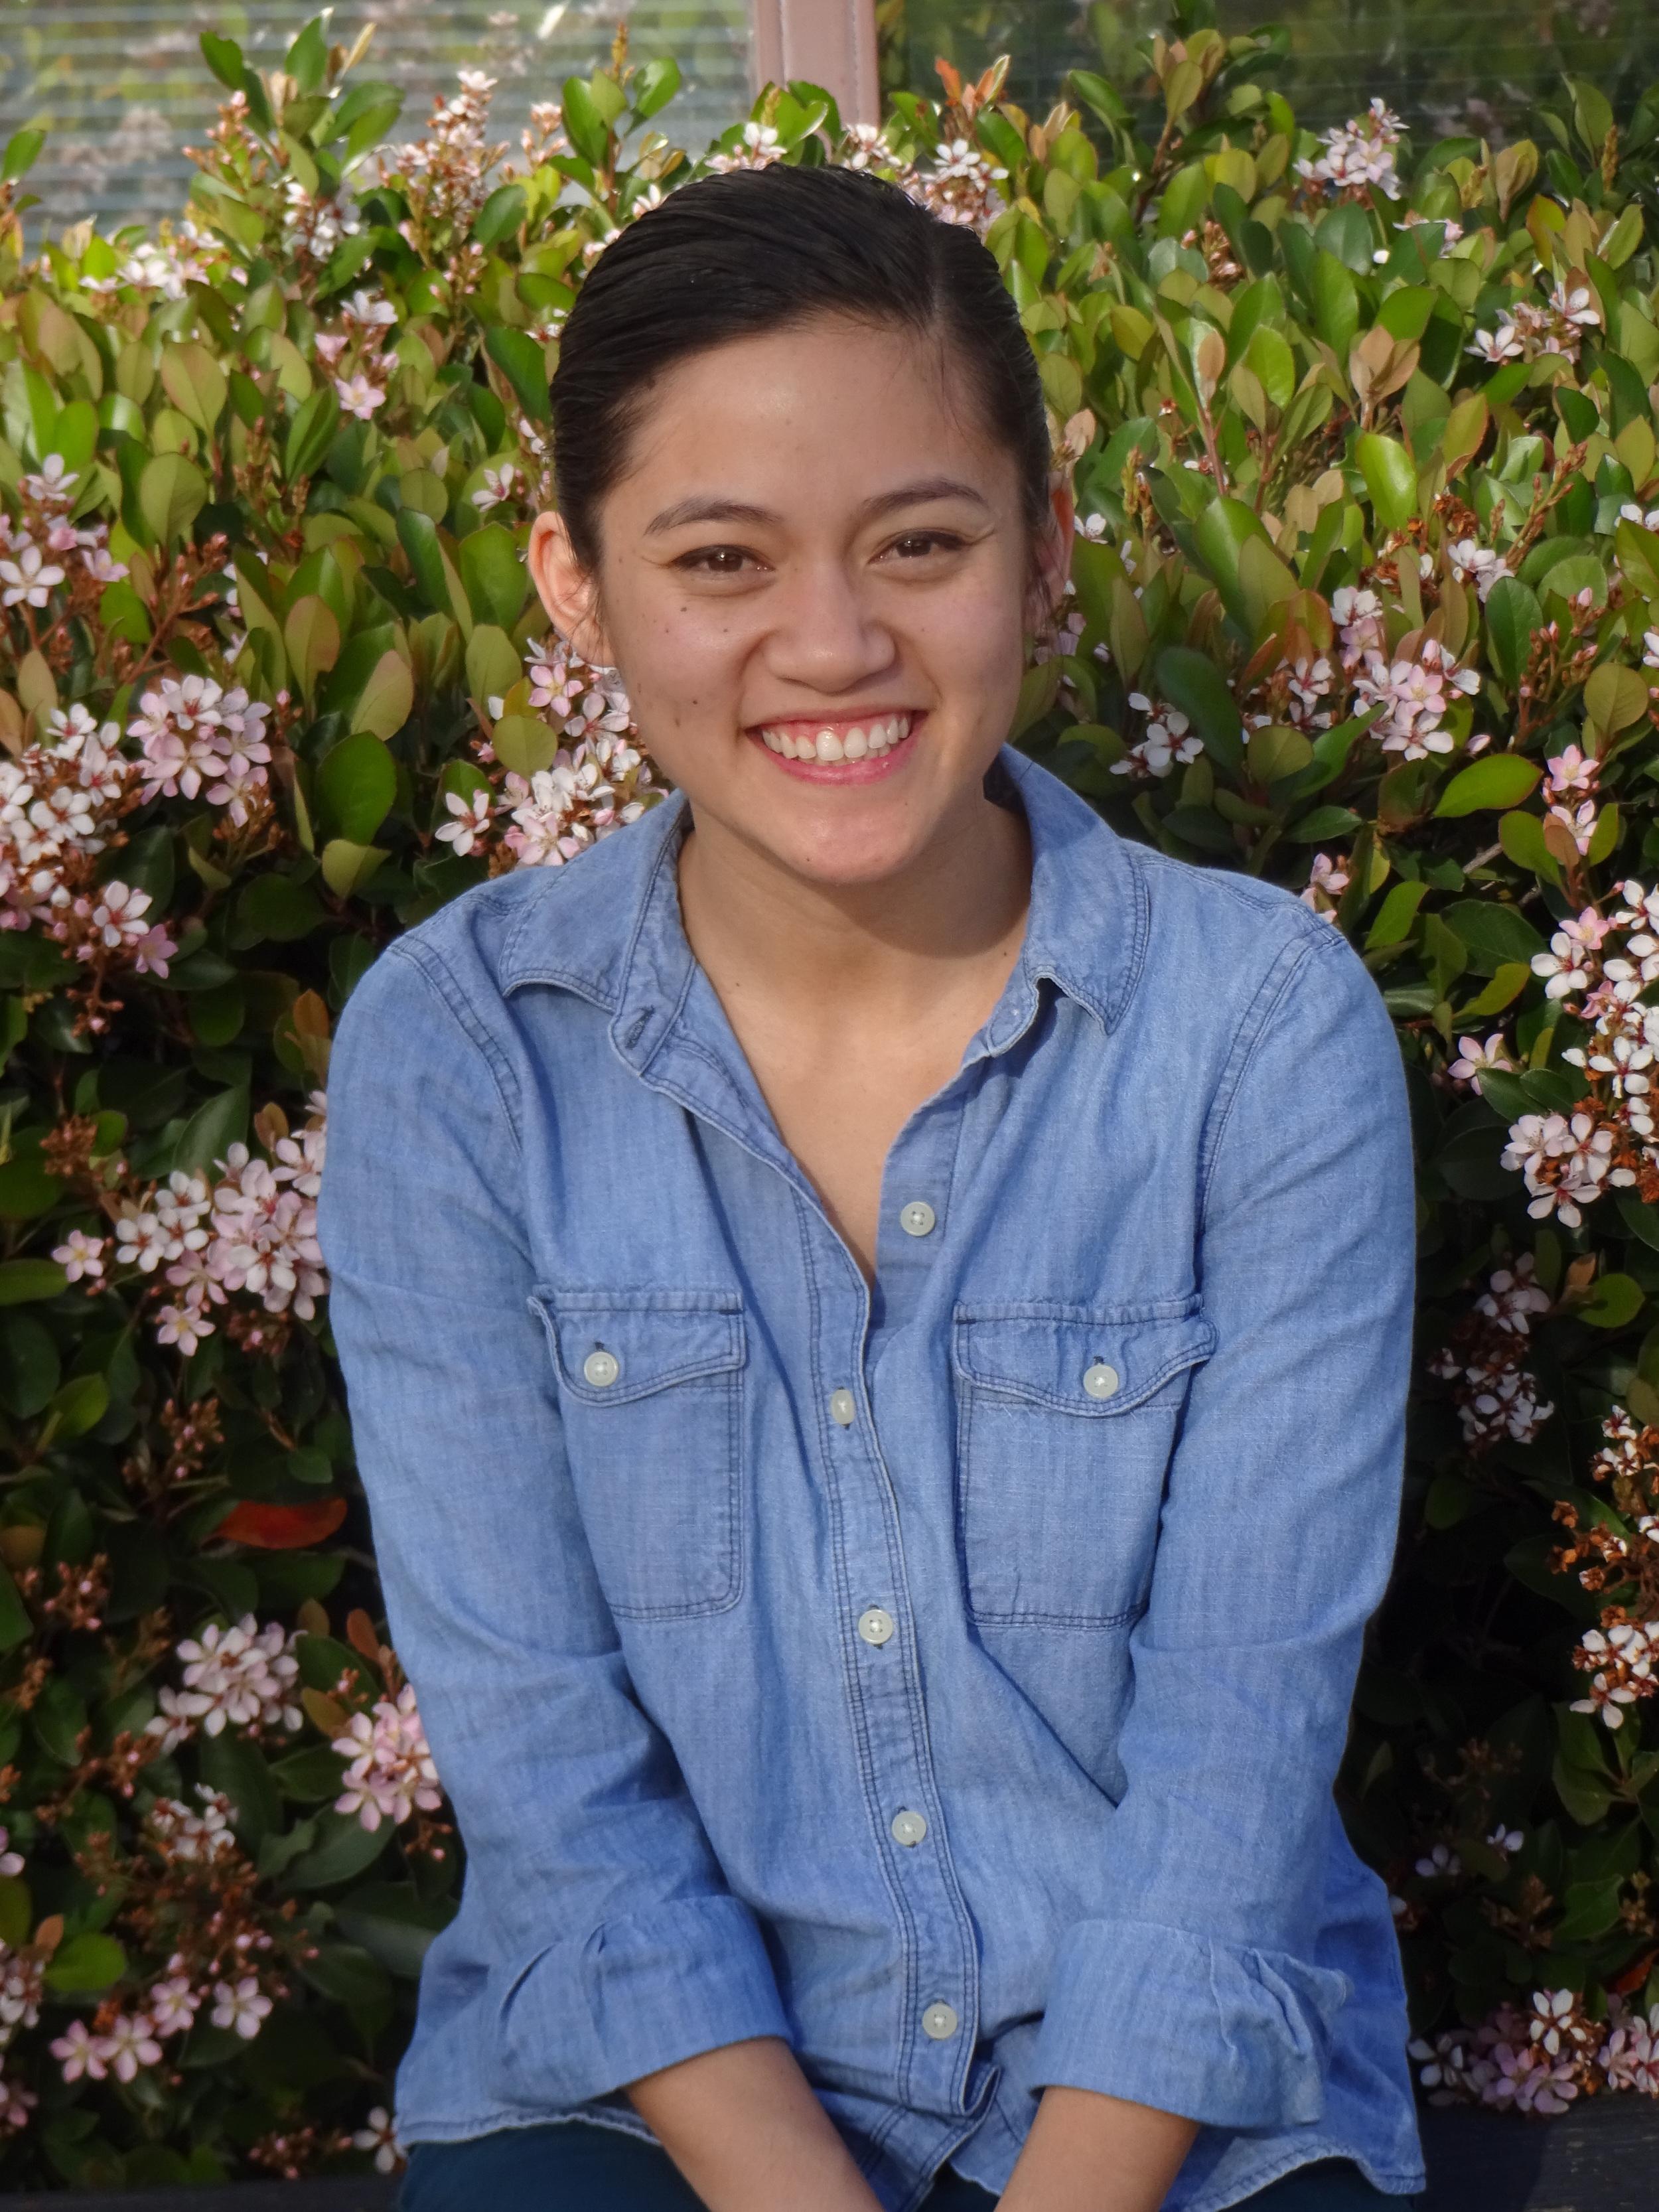 Courses: Algebra I, Geometry - Languages Spoken: English, Some Tagalog